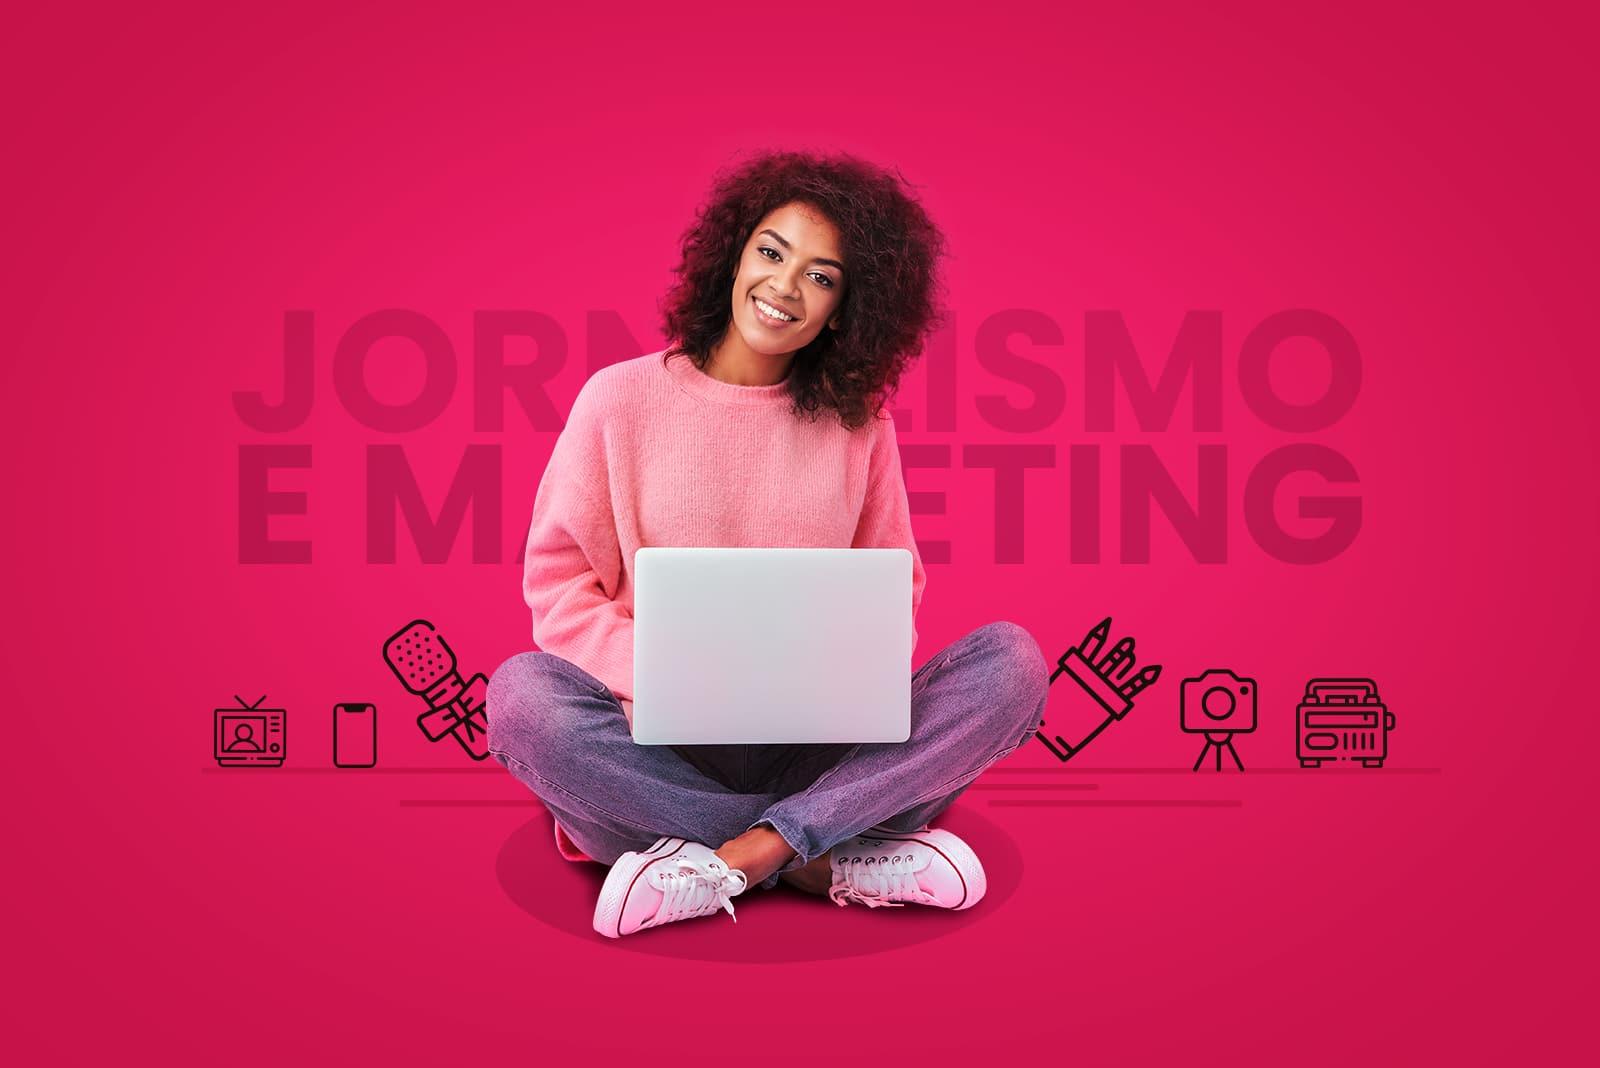 jornalista-de-marketing-digital